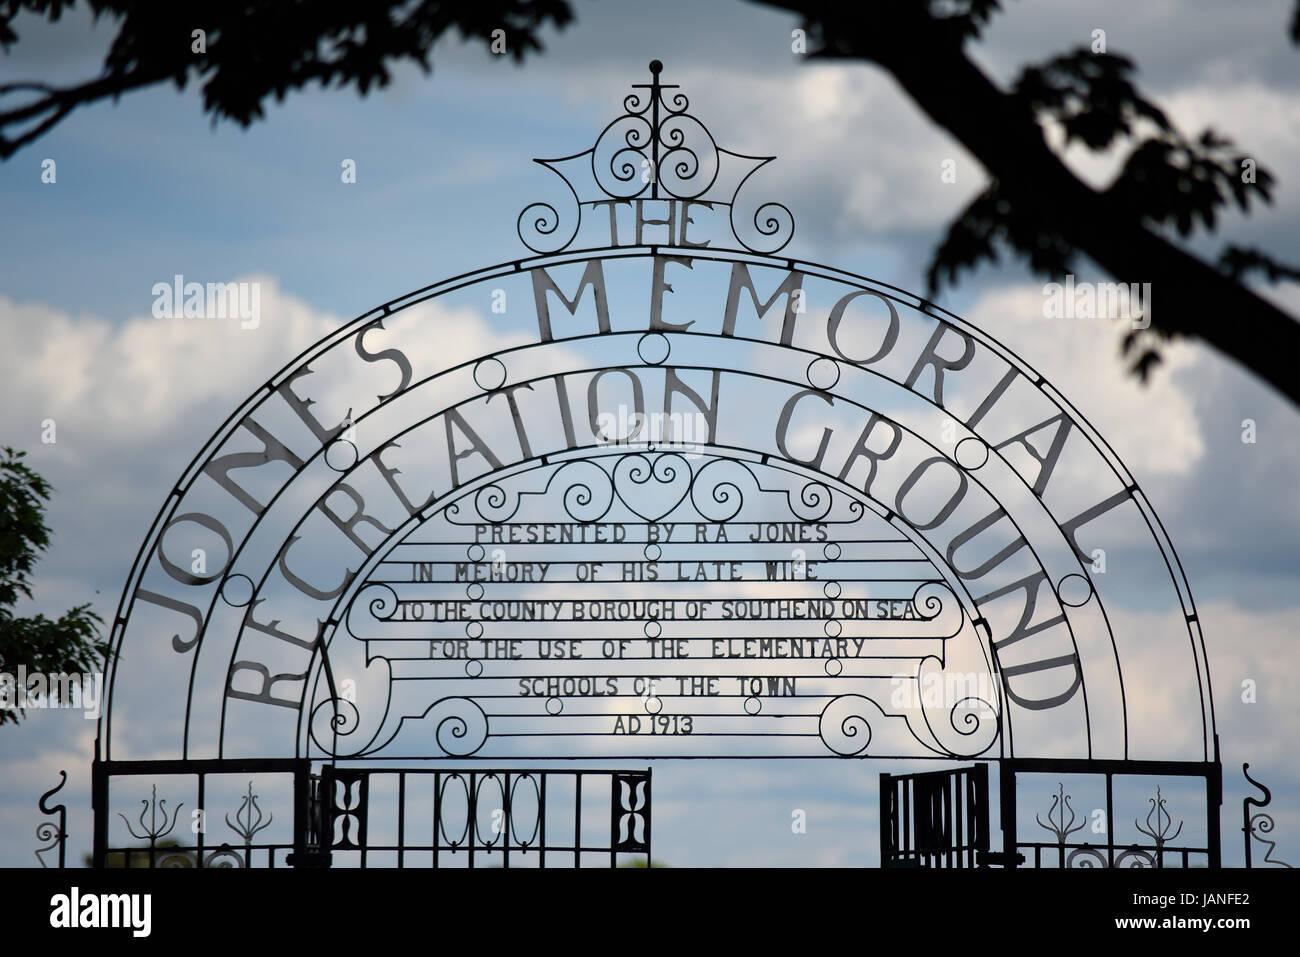 jones-memorial-recreation-ground-gates-in-southend-on-sea-essex-entrance-JANFE2.jpg